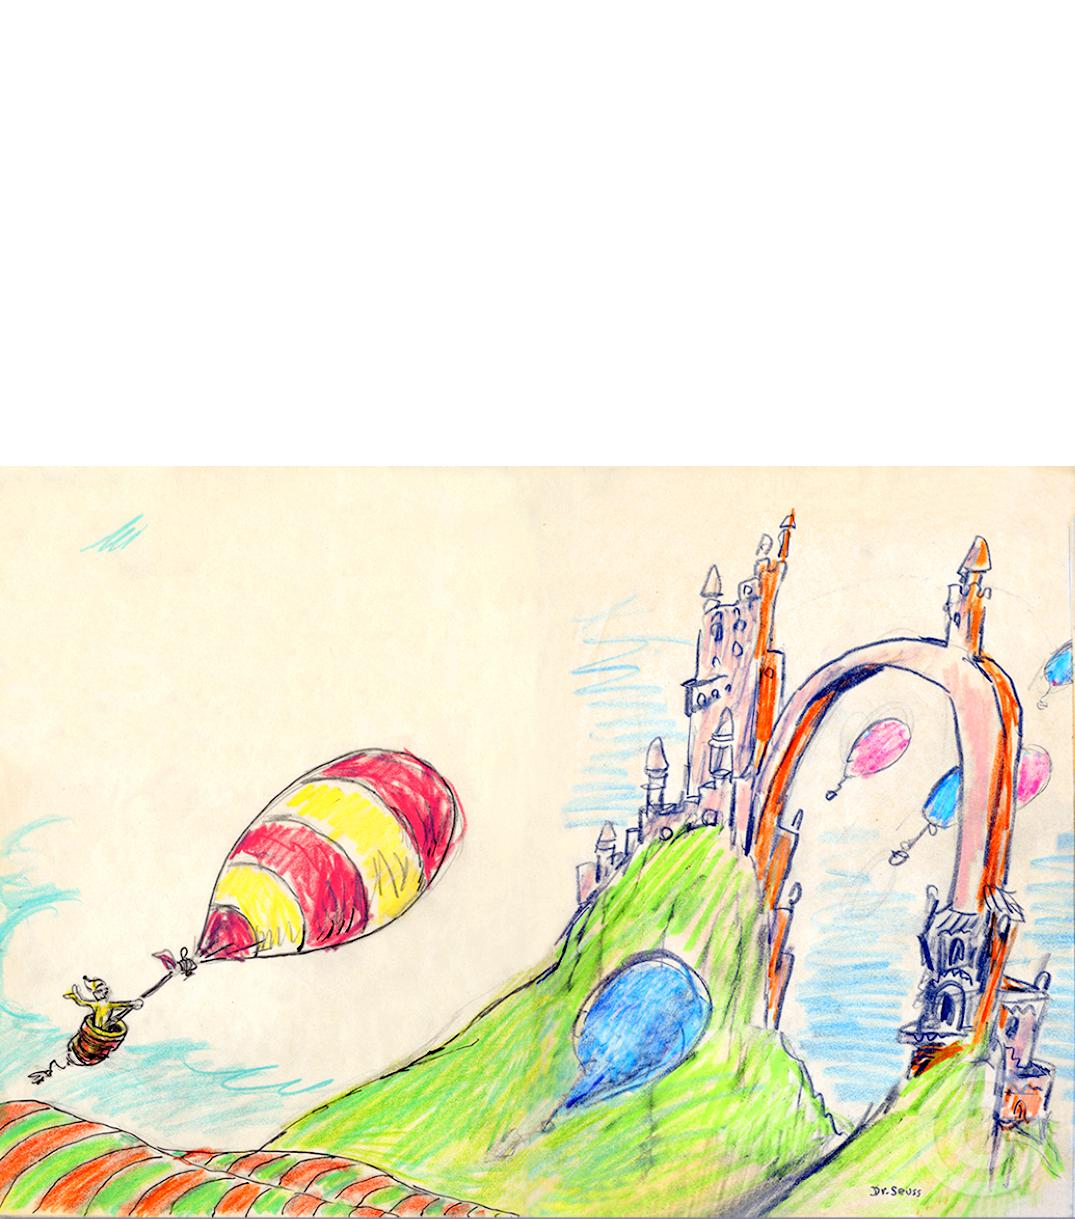 Dr. Seuss_Theodor Seuss Geisel_illustrative art_secret art, unorthodox taxidermy_Rare art_American Children's author_Illus